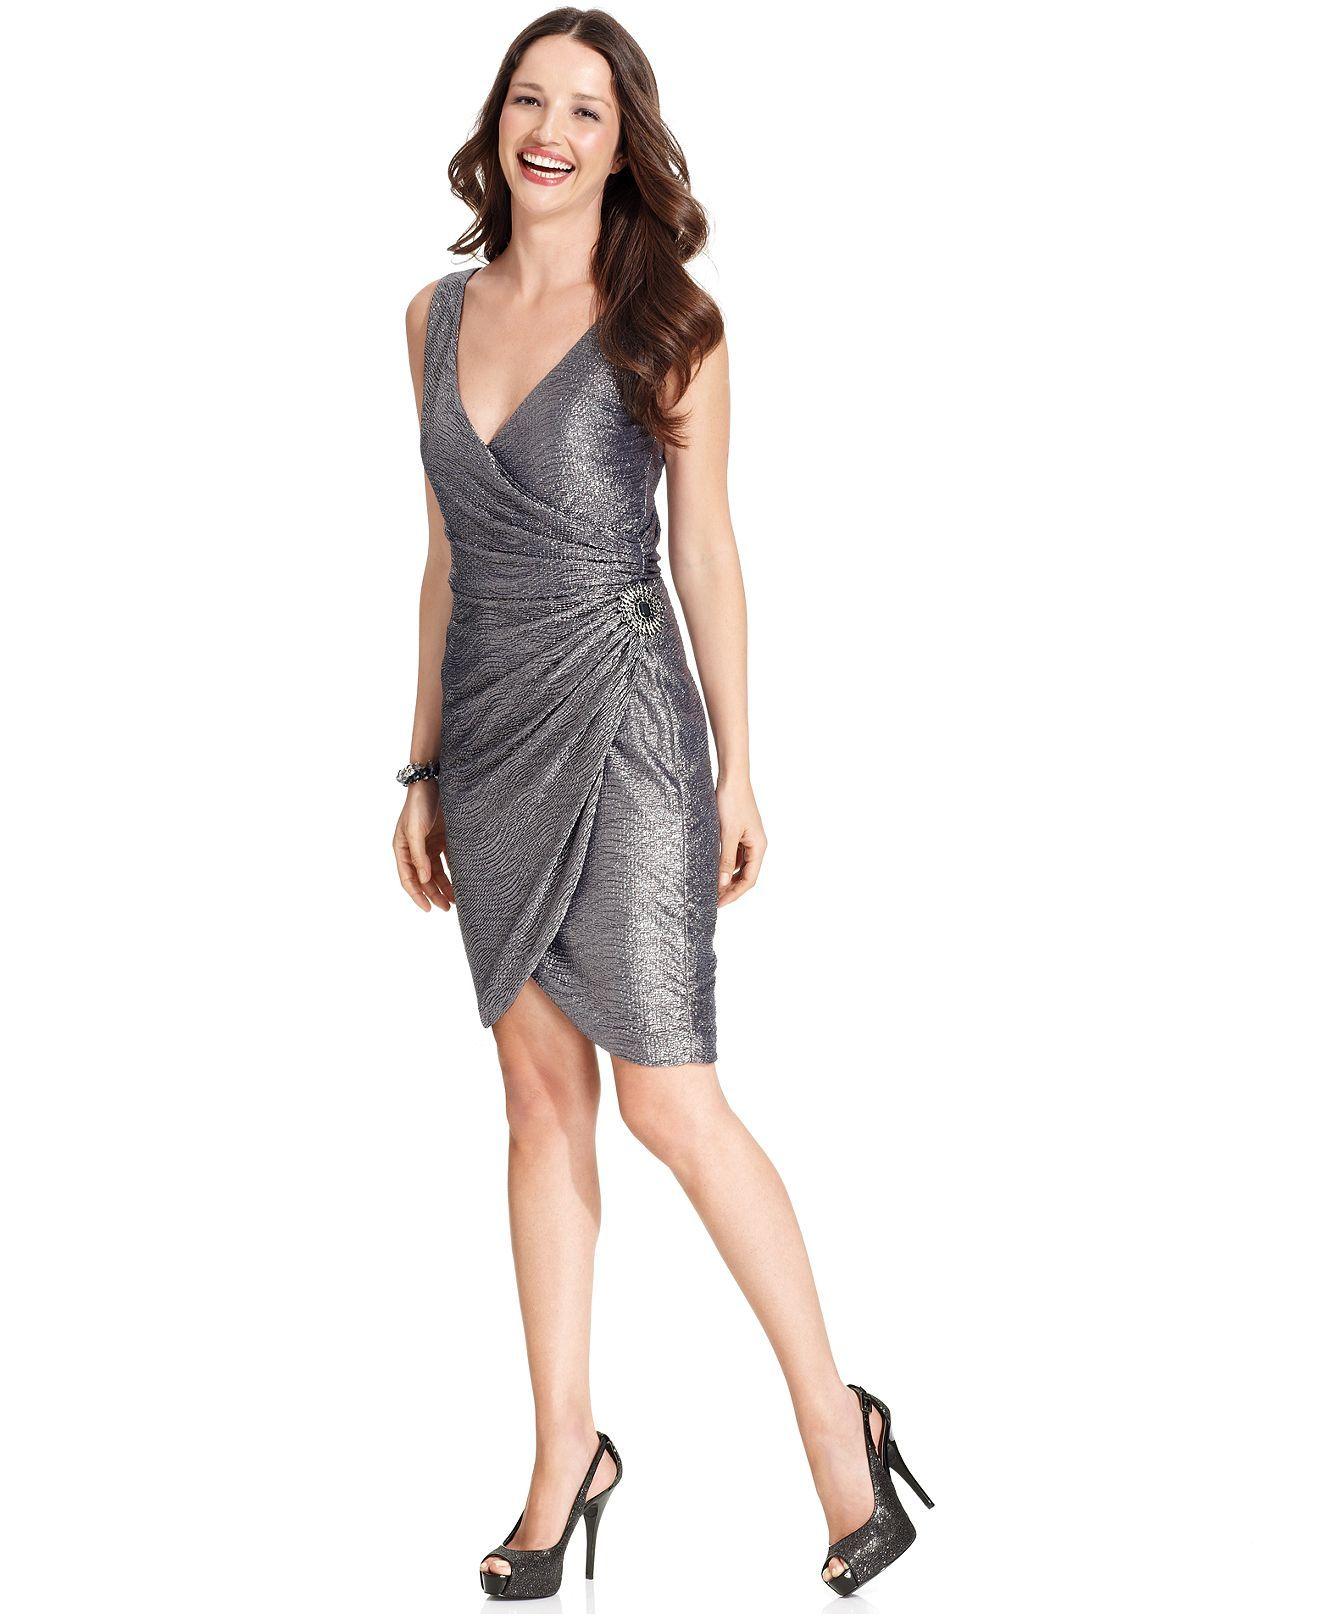 996f9779 Maggy London Dress, Sleeveless Metallic Tulip-Hem - Womens Dresses - Macy's